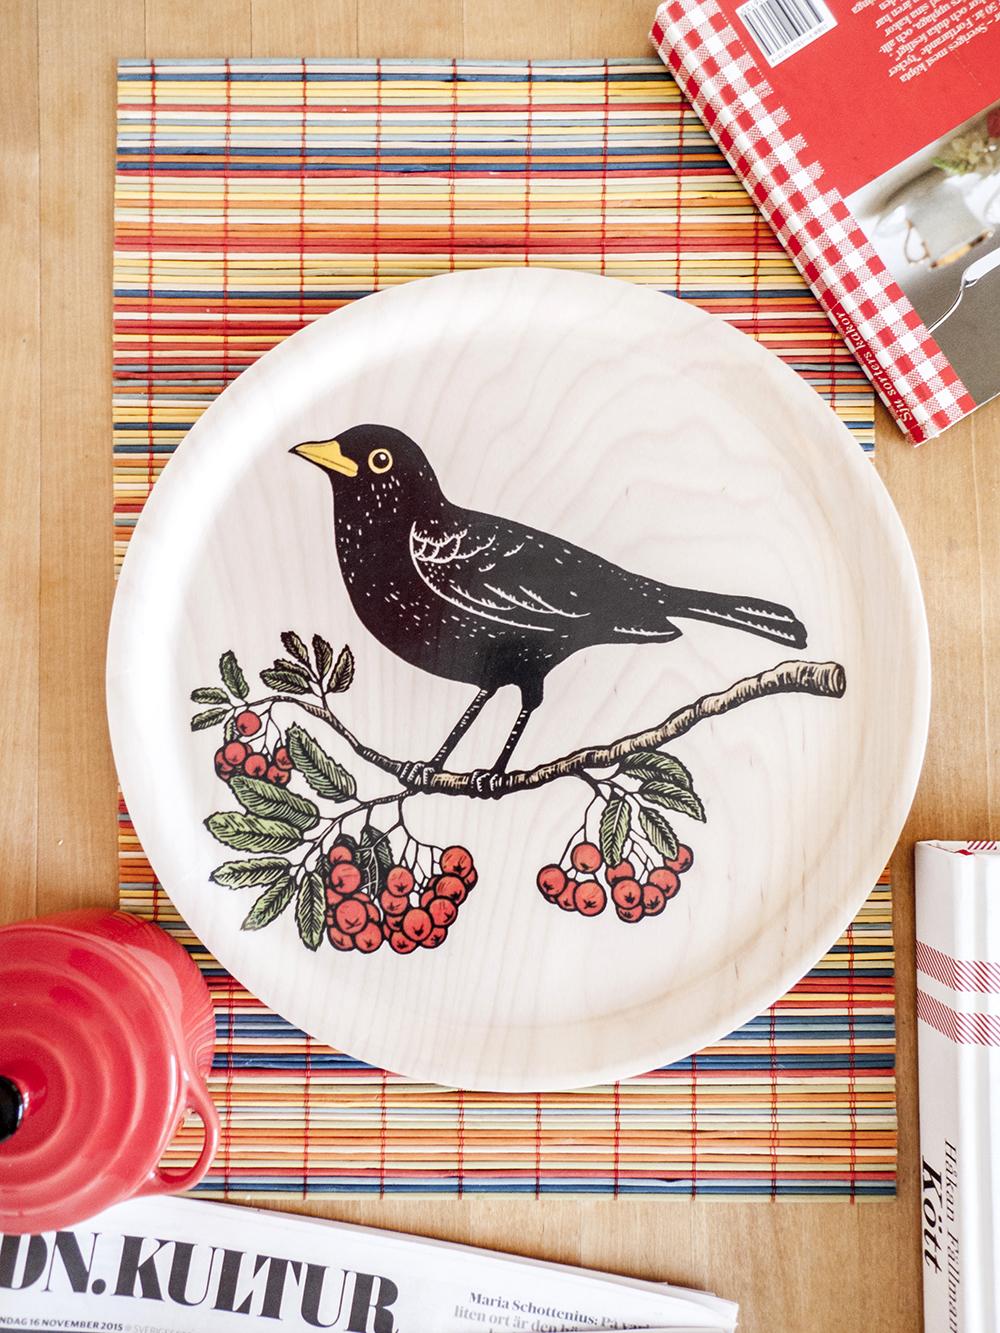 koltrast-blackbird-rowanberry-linocut-birch-tray-bricka-1-1000.jpg